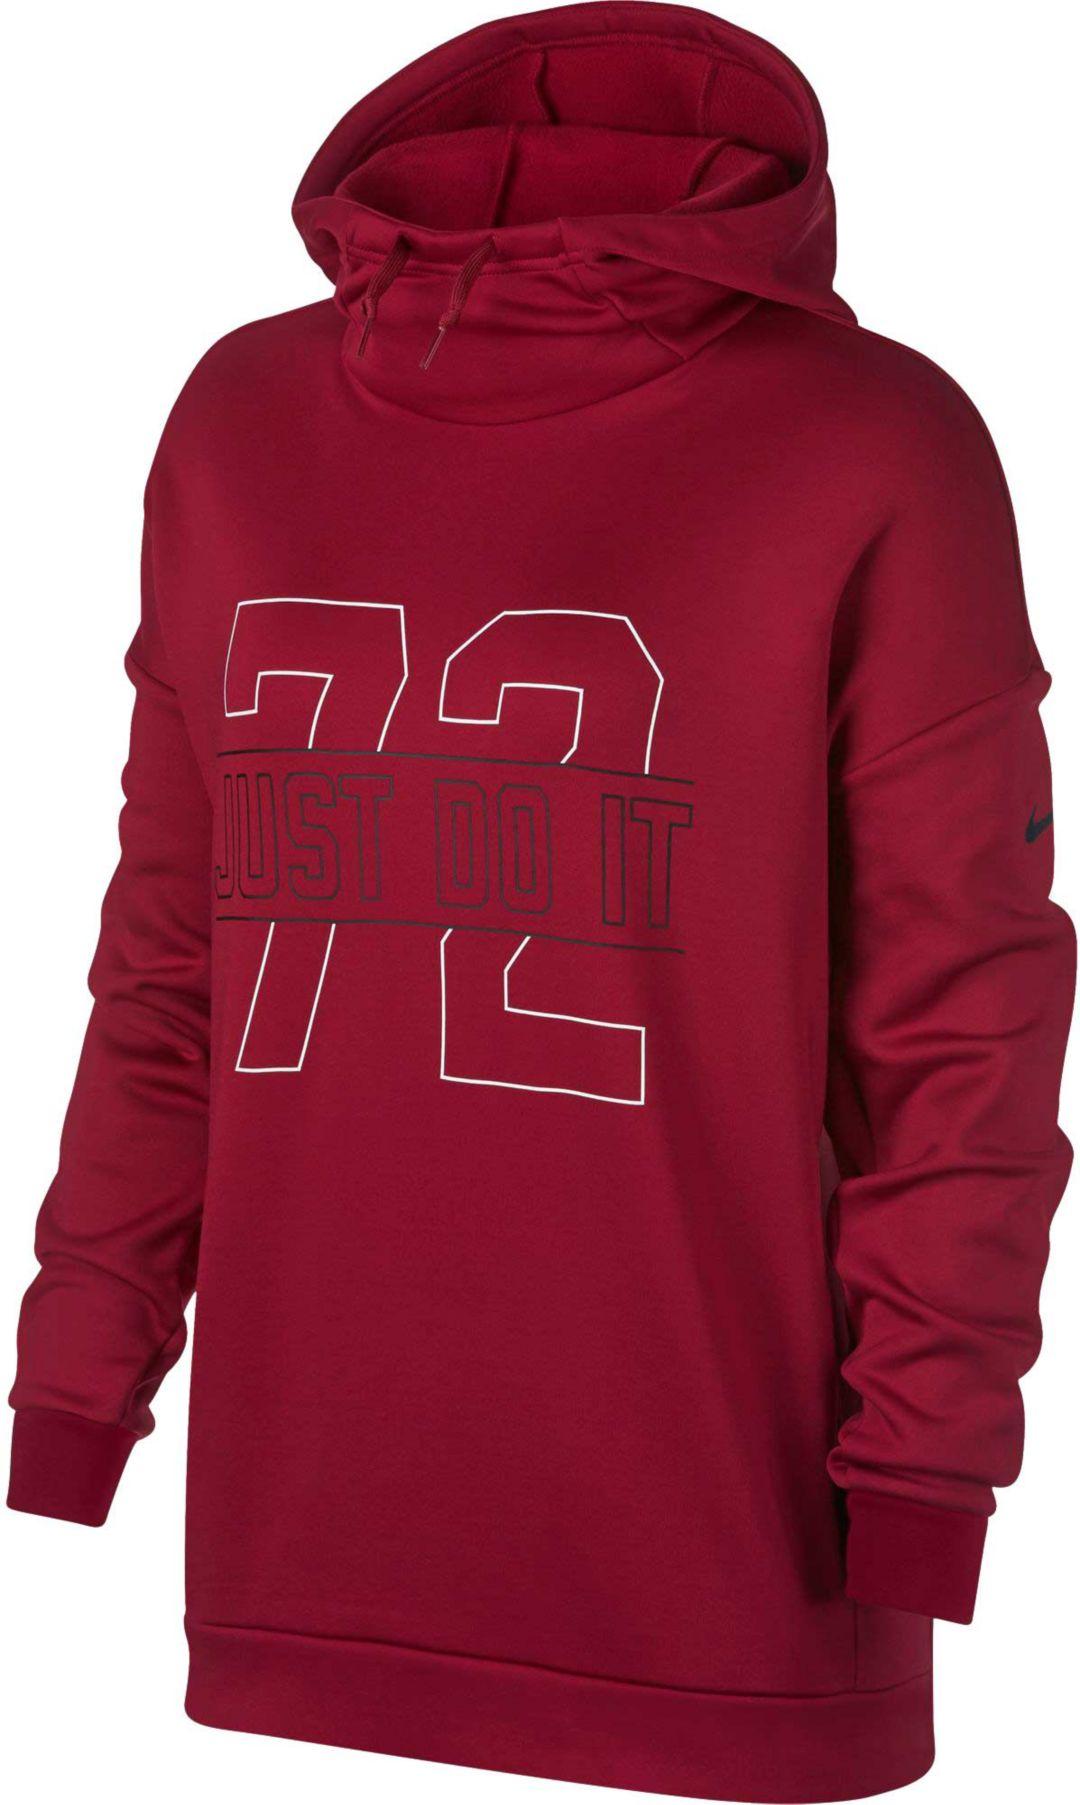 daa5ba023 Nike Women's Therma Fleece Training Hoodie | DICK'S Sporting Goods